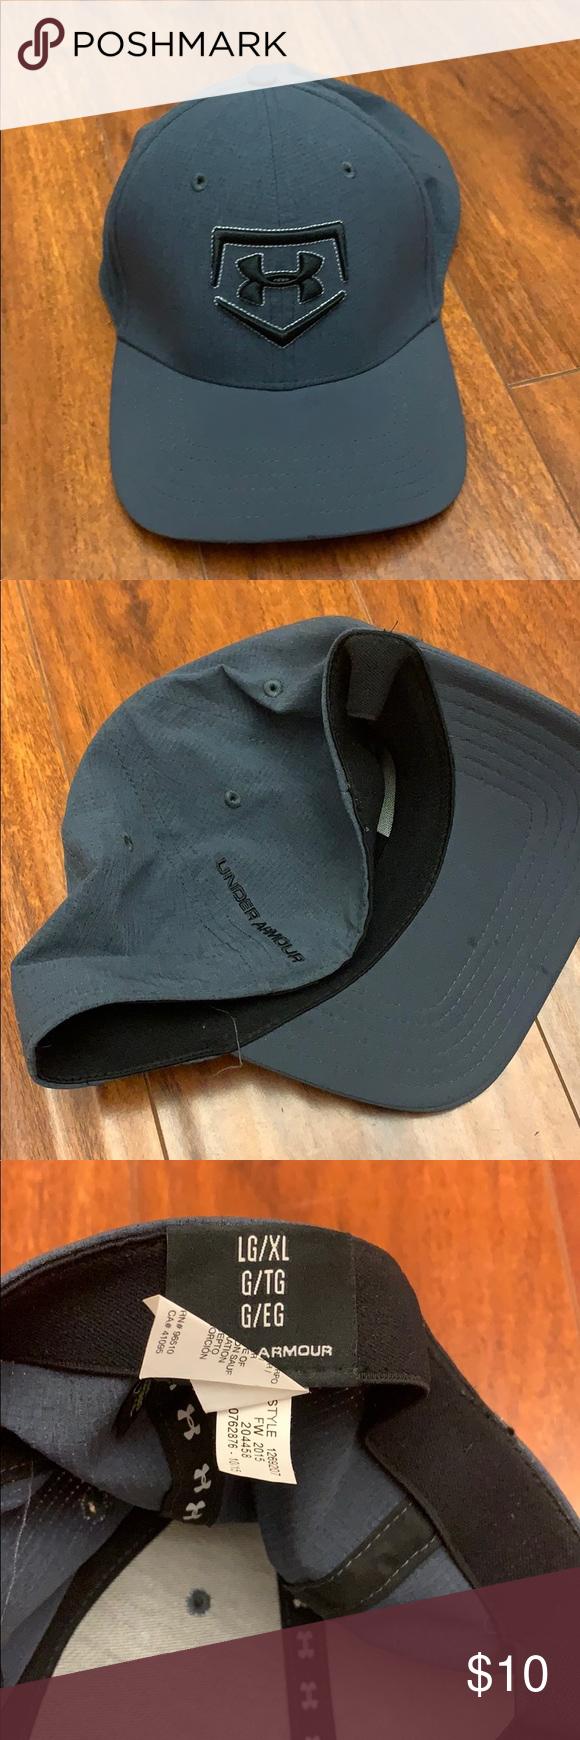 Under Armour Lg Xl Golf Hat Golf Hats Under Armour Hats